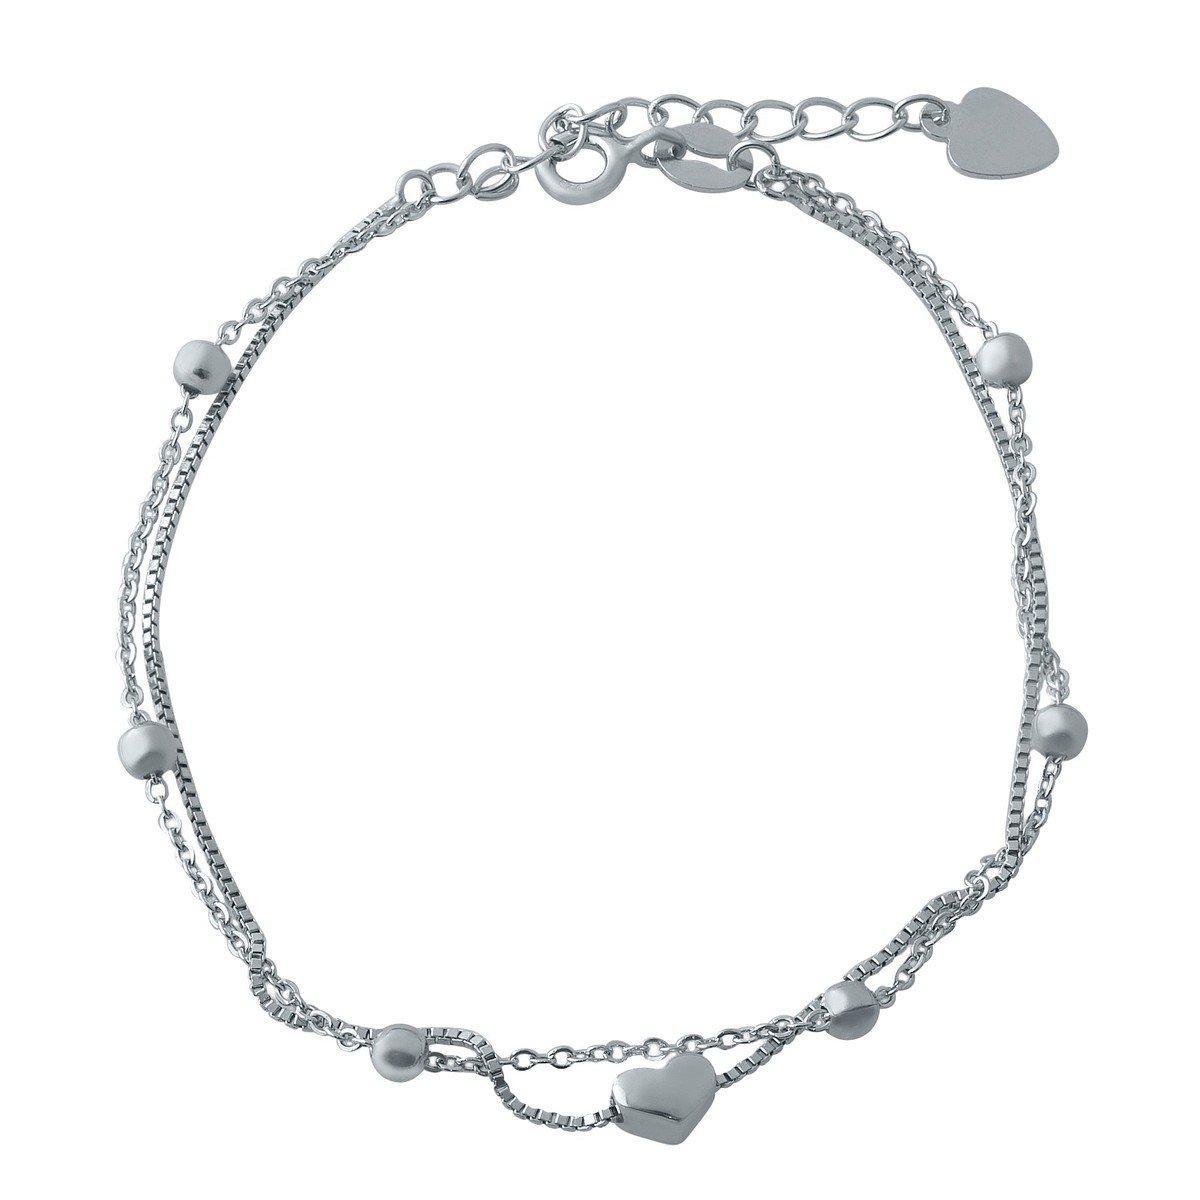 Серебряный браслет DreamJewelry без камней (1994153) 1720 размер